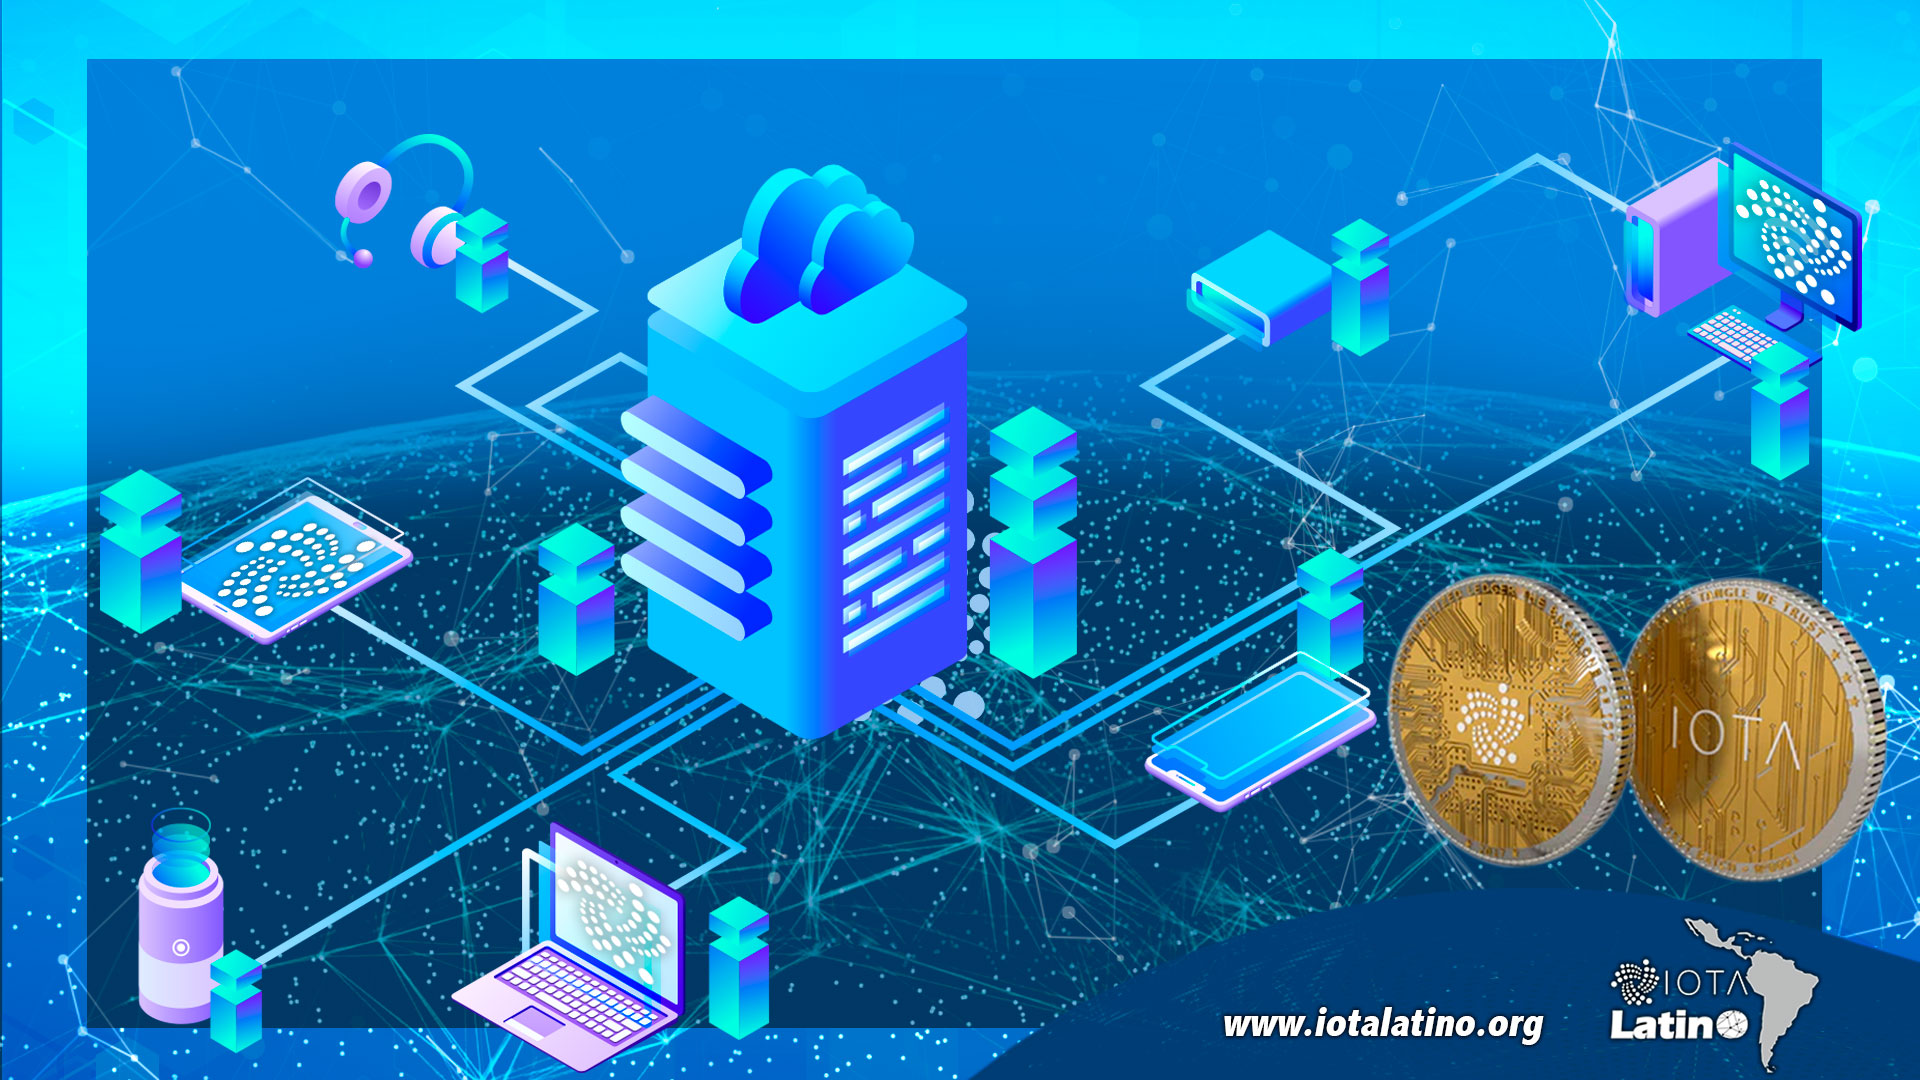 iotalatino -IOTA-Pago-digital-Iota (1)